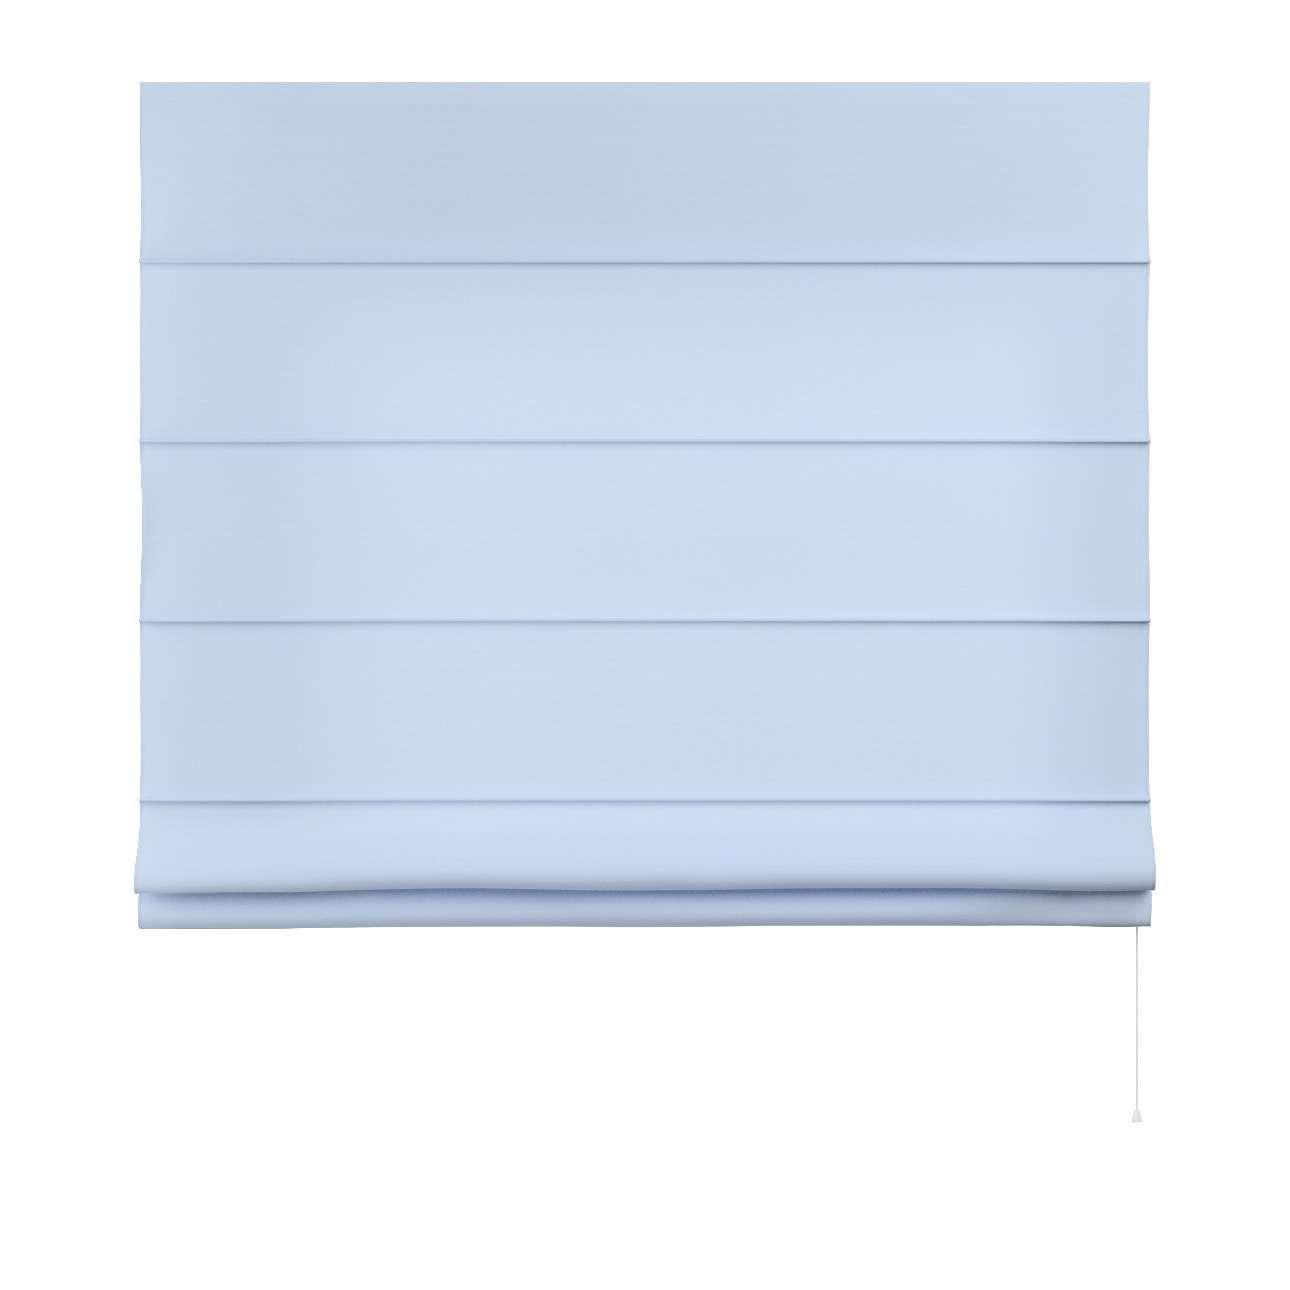 Romanetės Capri 80 x 170 cm (plotis x ilgis) kolekcijoje Loneta , audinys: 133-35